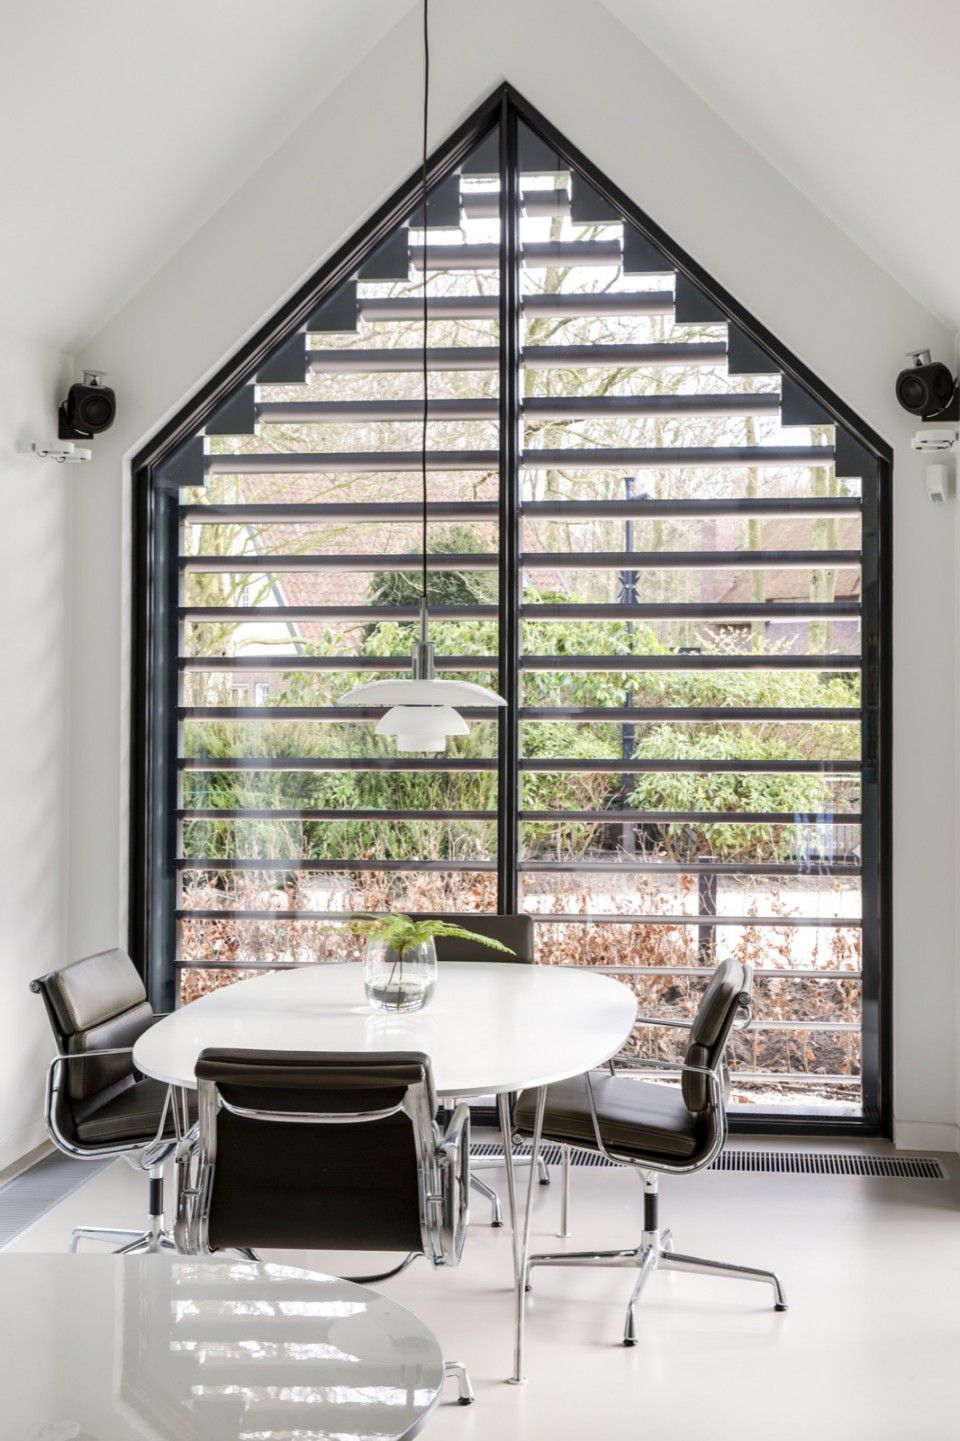 Window coverings of idaho  rebecca strack xspenc on pinterest